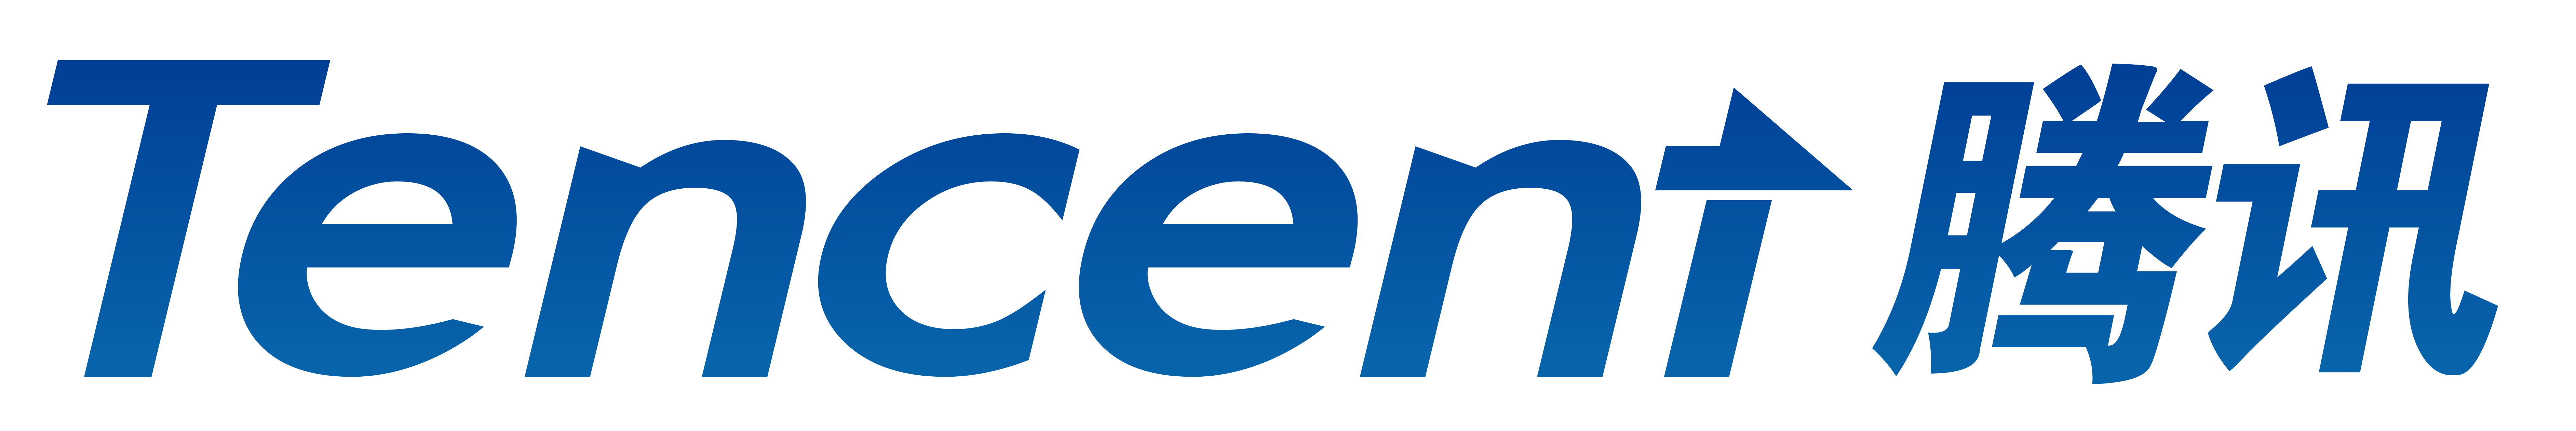 Tencent – Logos Download